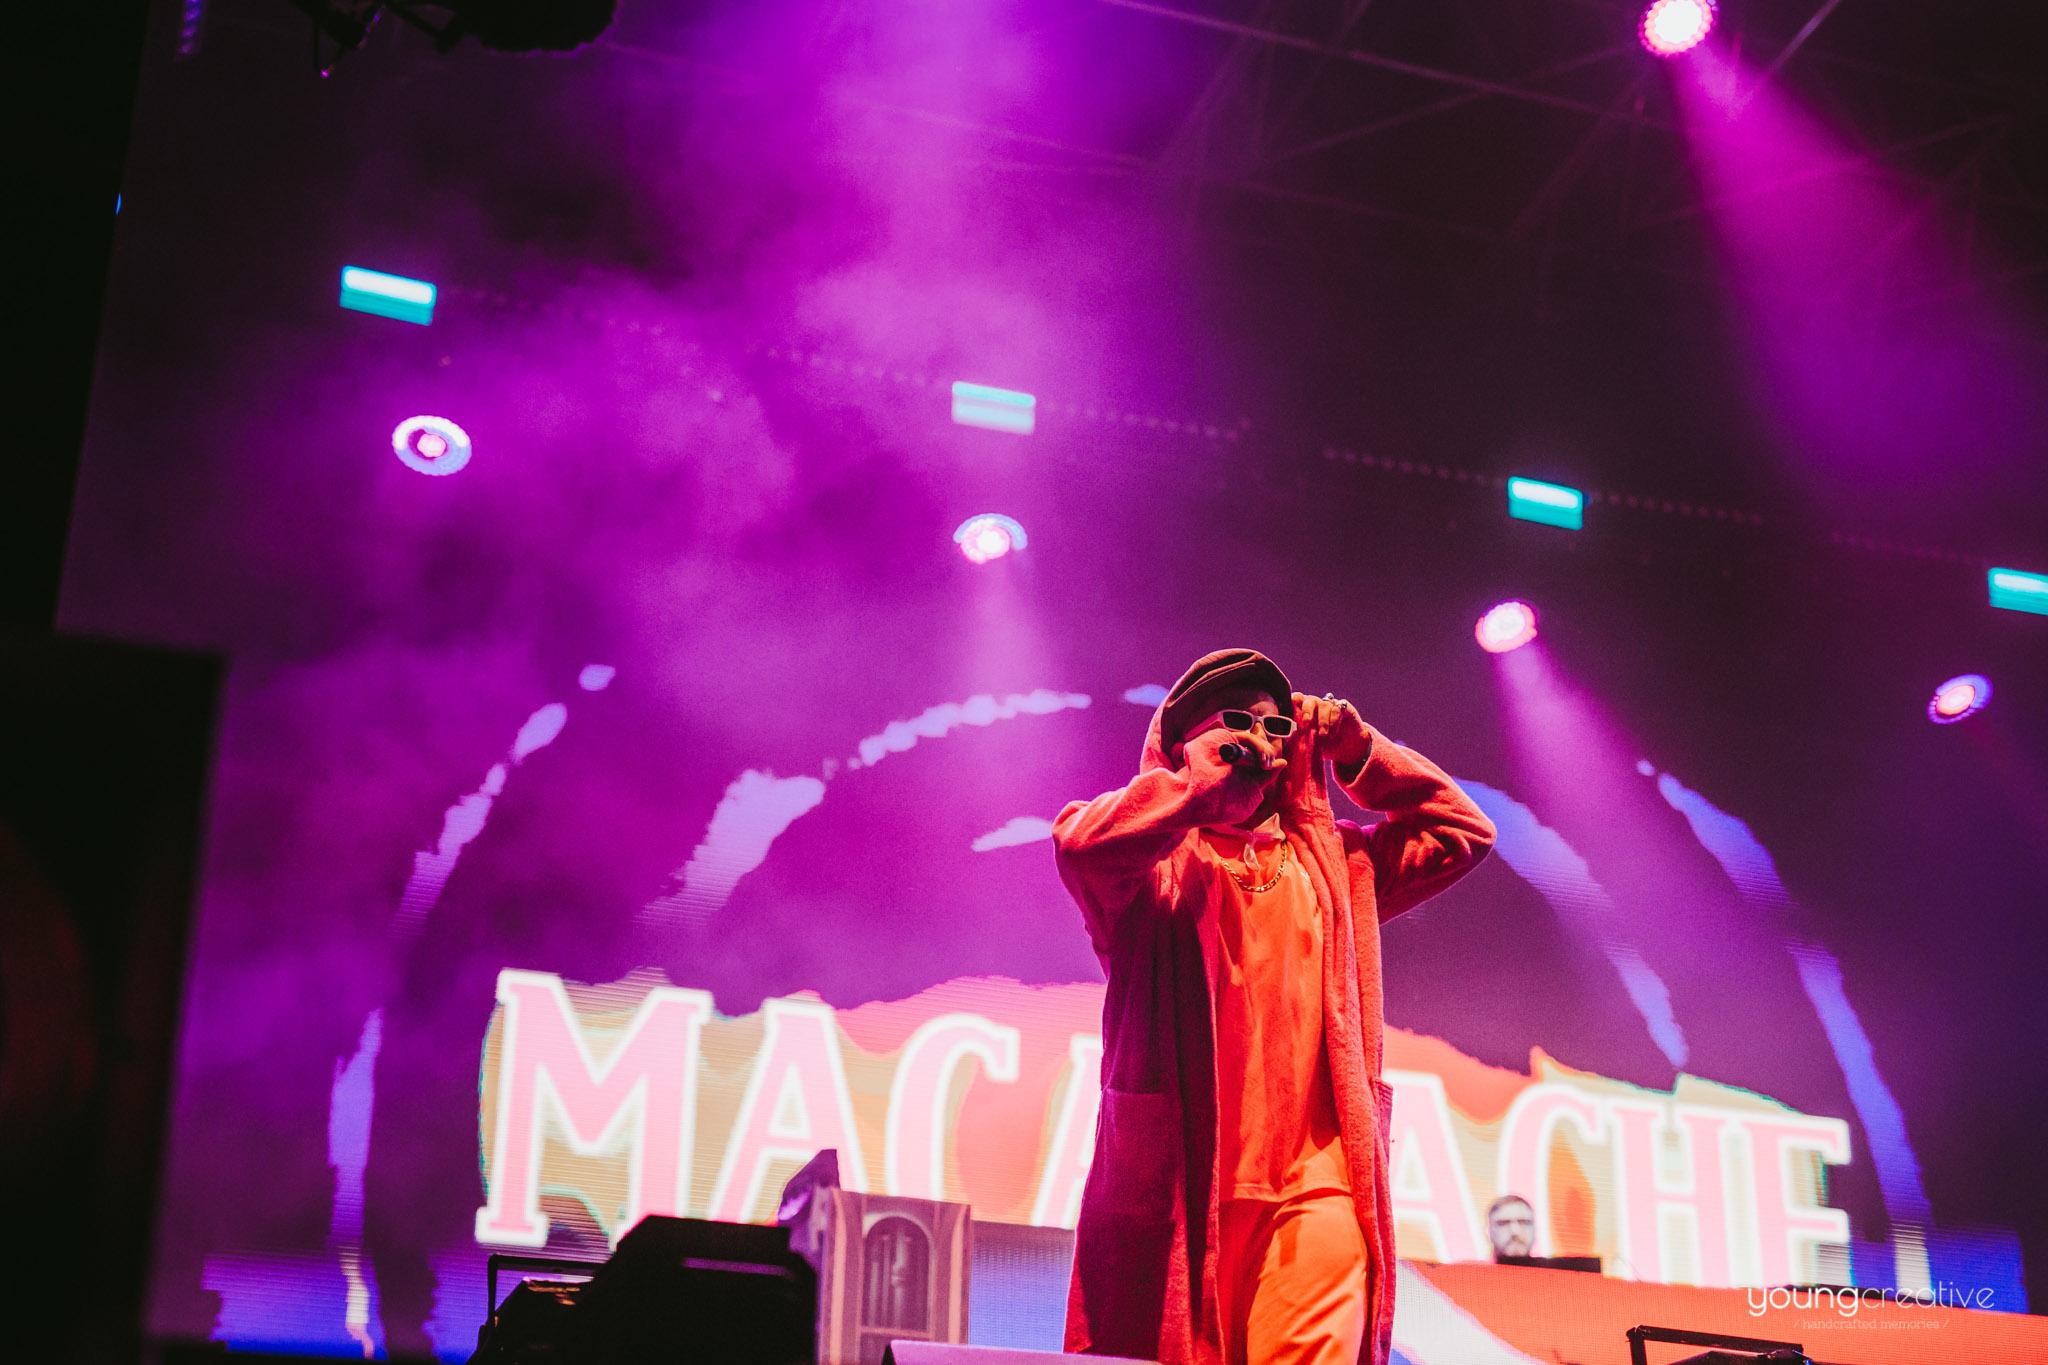 Macanache @ Untold 2019 | youngcreative.info media | Cristina Bejan, Dan Filipciuc